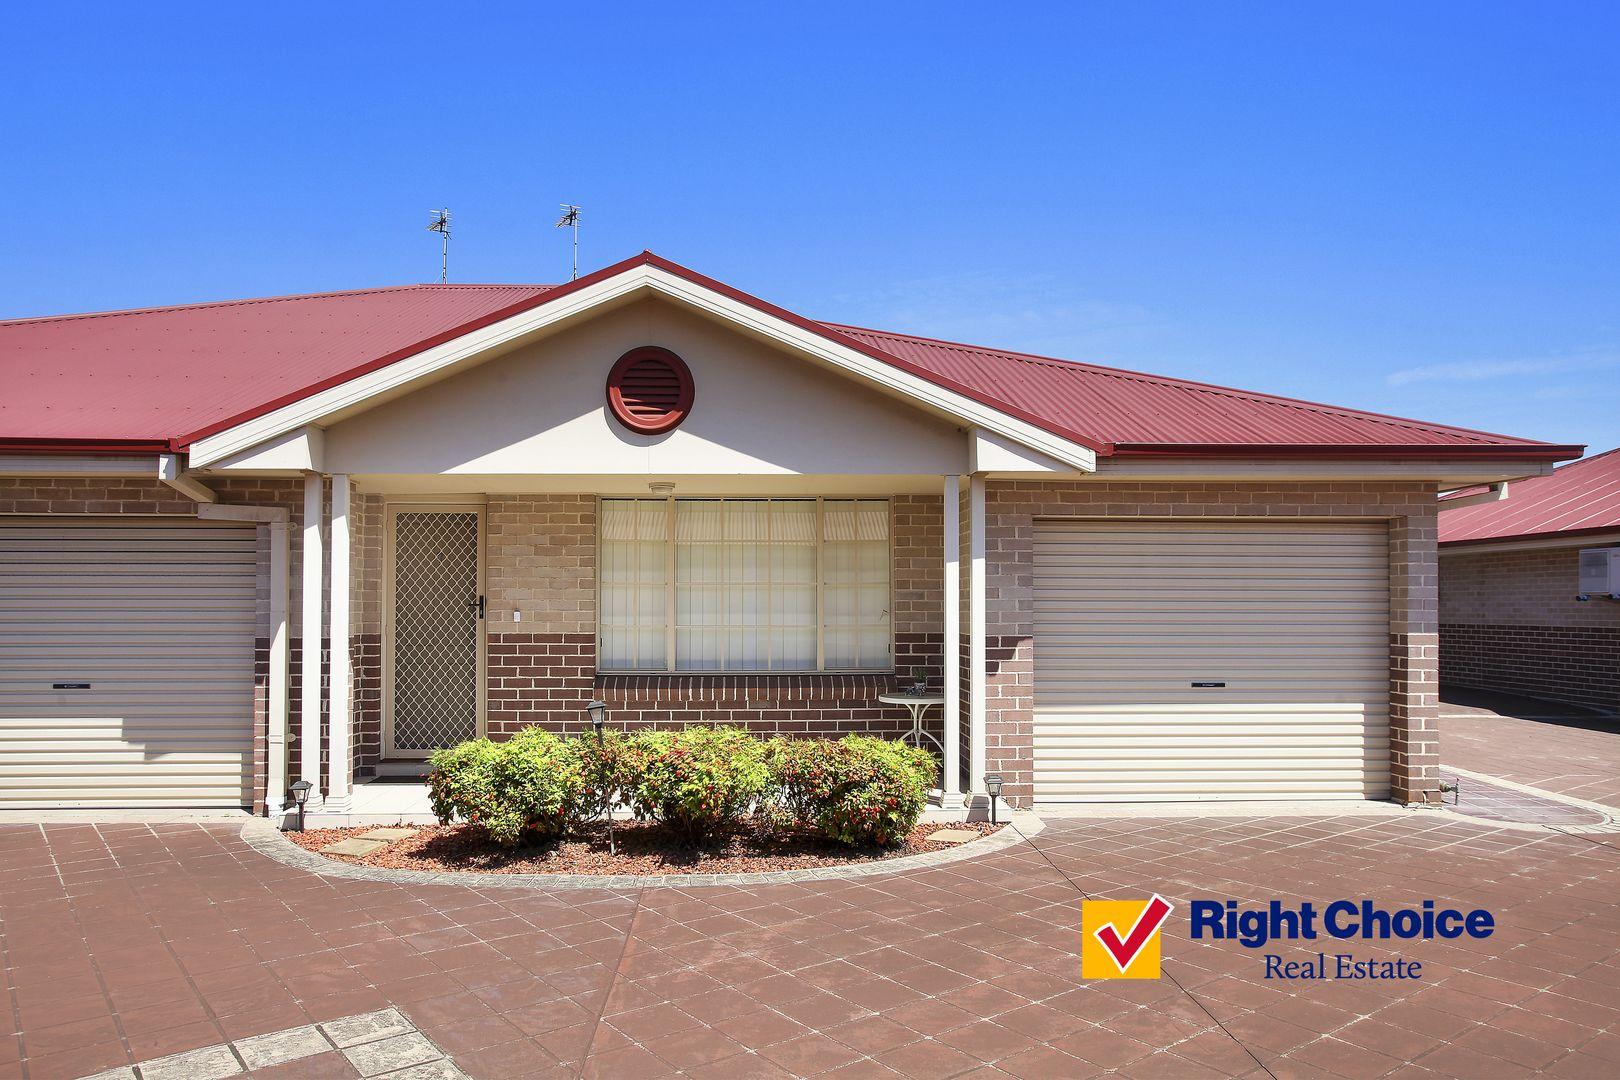 7/101-105 Tongarra Road, Albion Park NSW 2527, Image 0